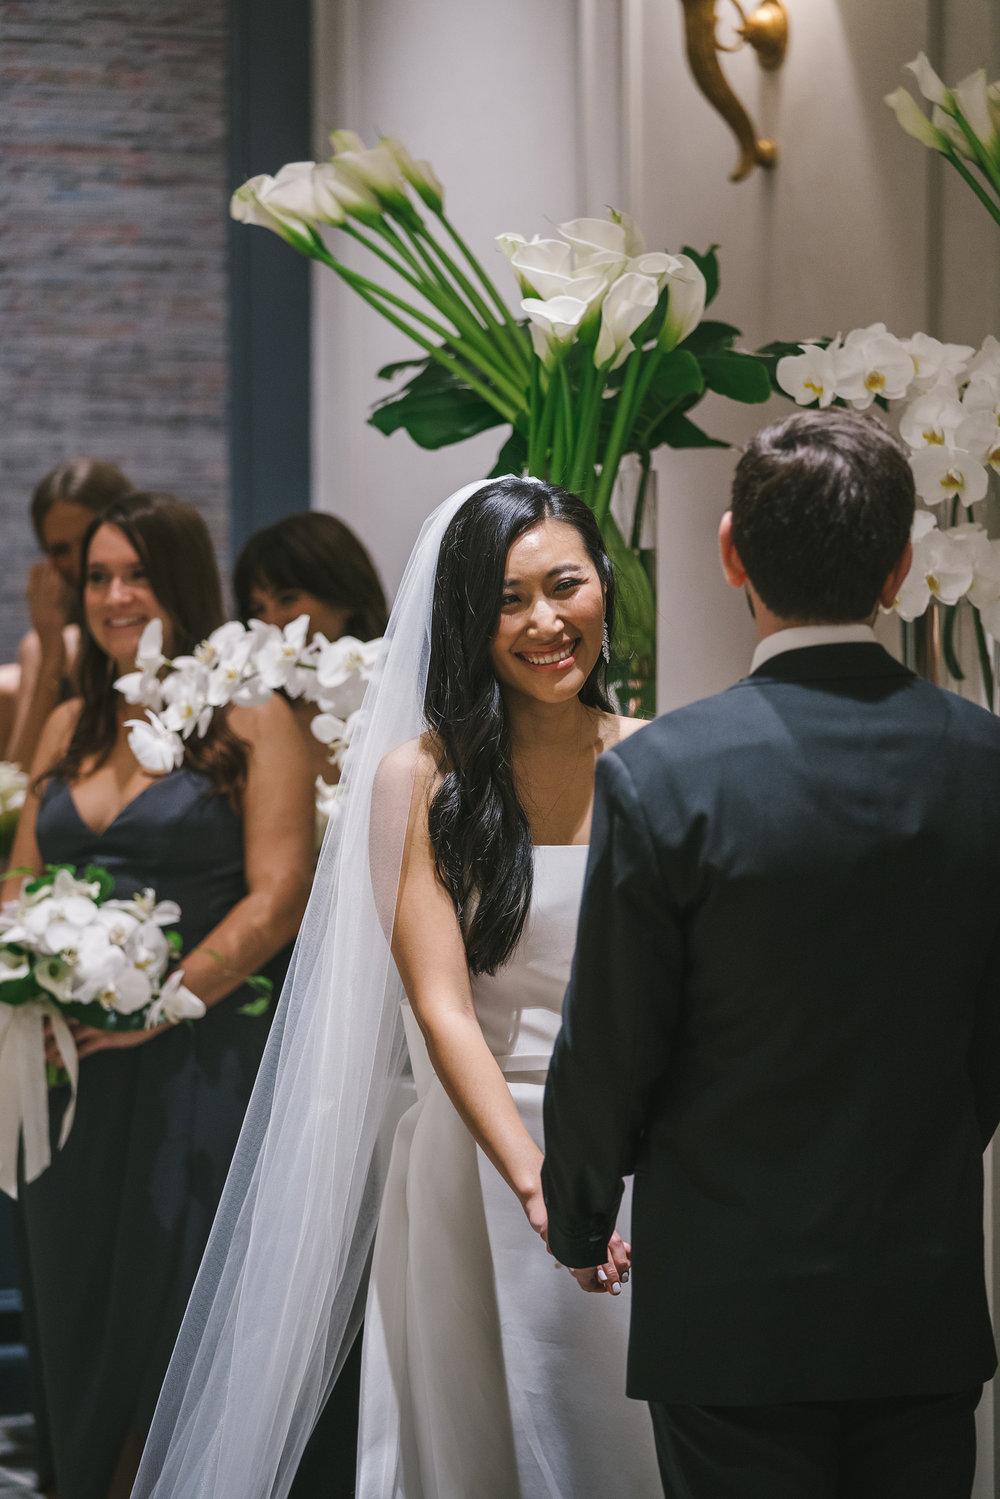 Hotel Wedding Ceremony Ideas